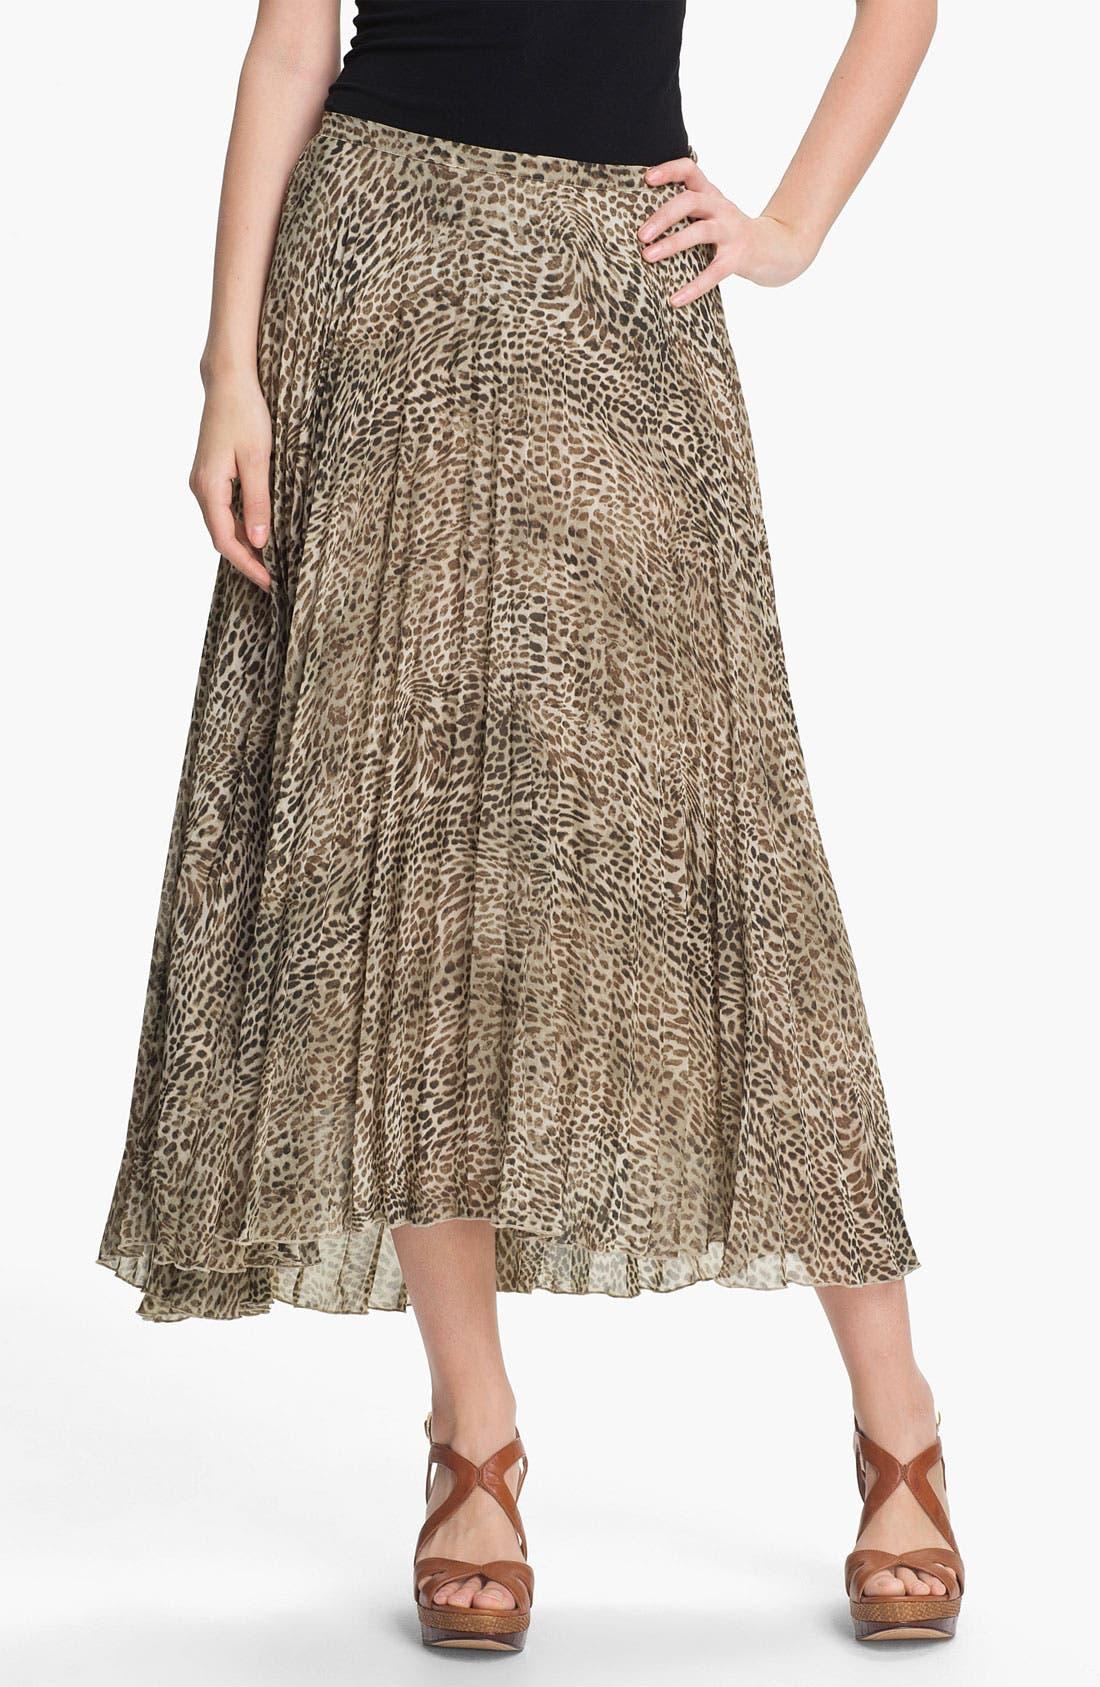 Cheetah Print Crystal Pleat Midi Skirt,                             Main thumbnail 1, color,                             271